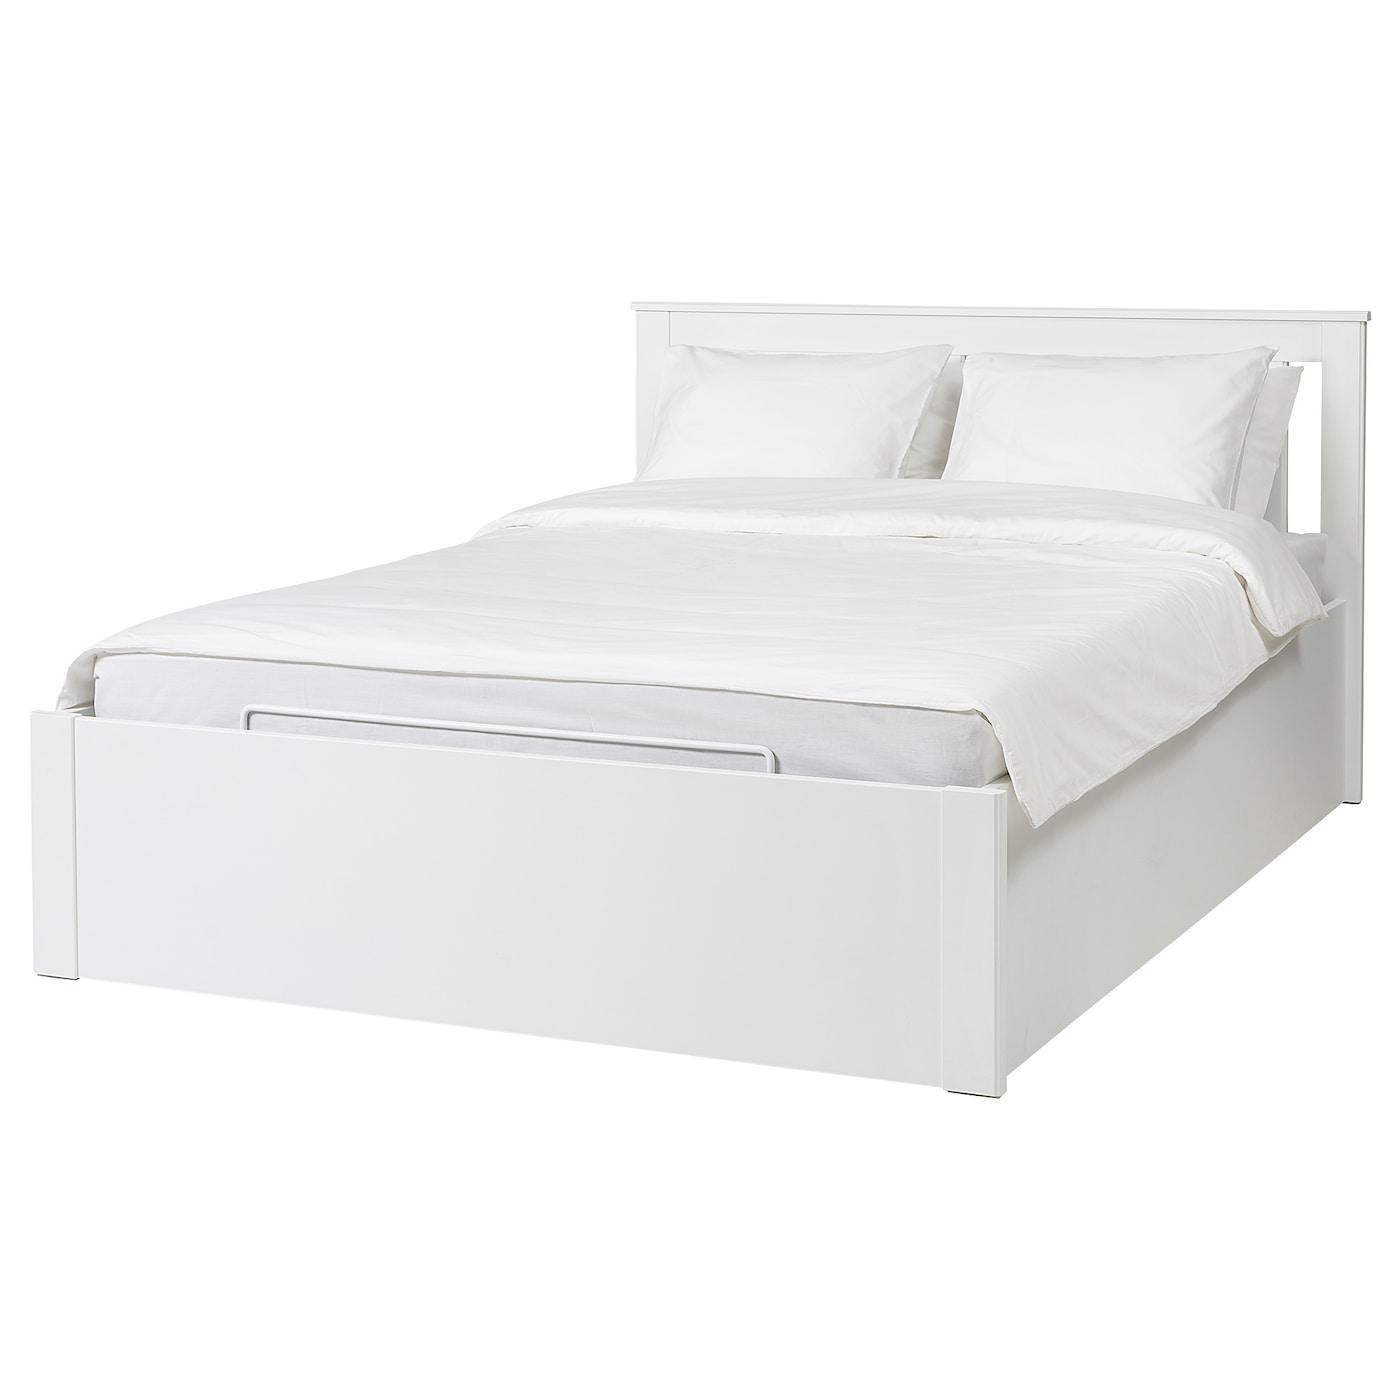 SONGESAND Cadre lit coffre - blanc - IKEA